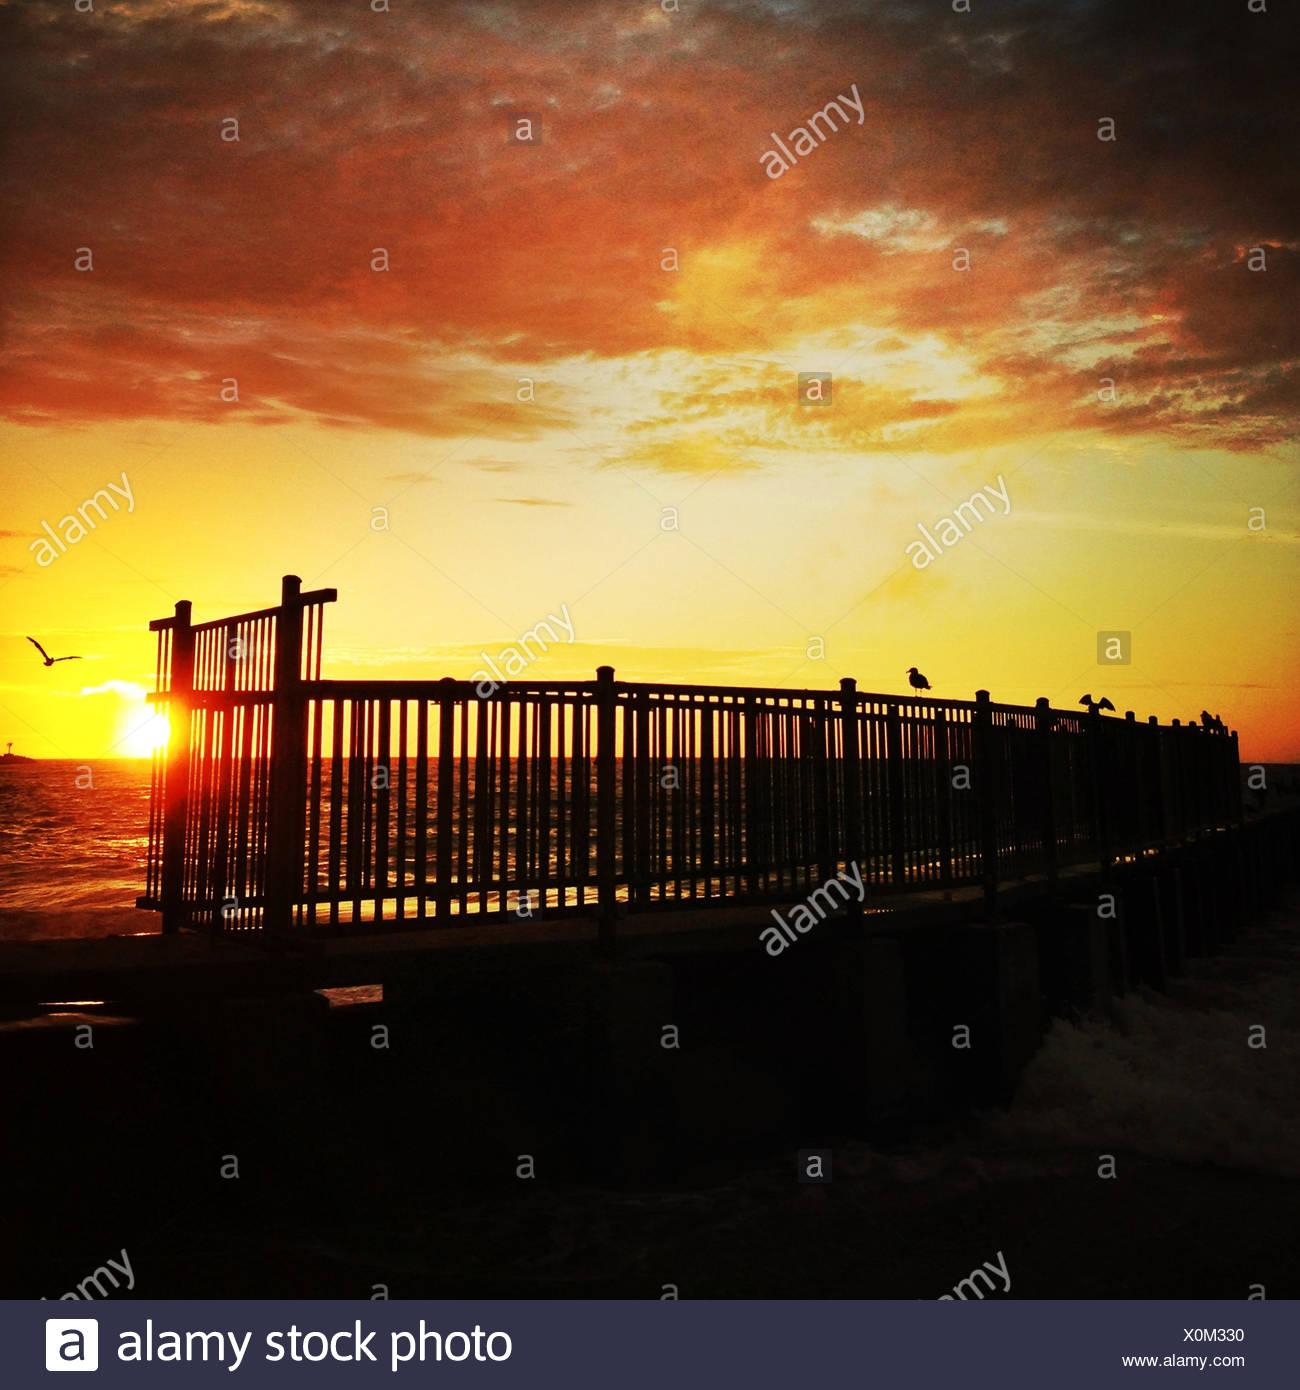 USA, California, Los Angeles, Playa Del Rey, Sonnenuntergang Stockbild